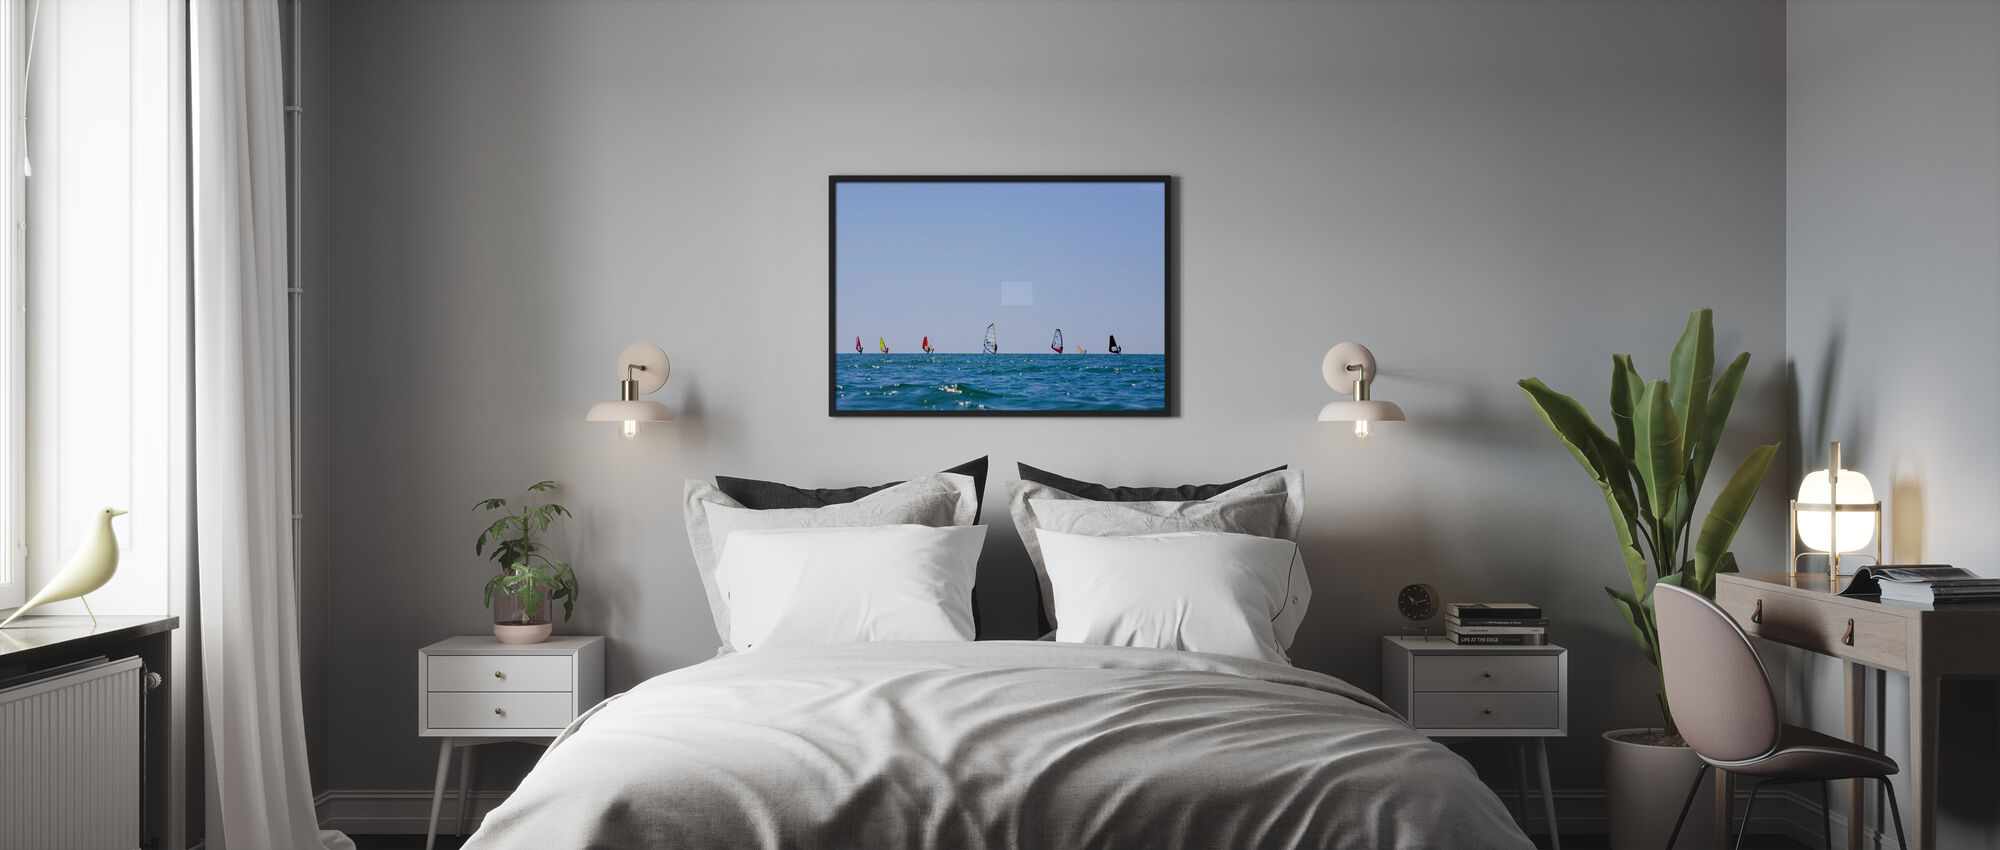 Windsurfen in Varberg, Schweden - Poster - Schlafzimmer